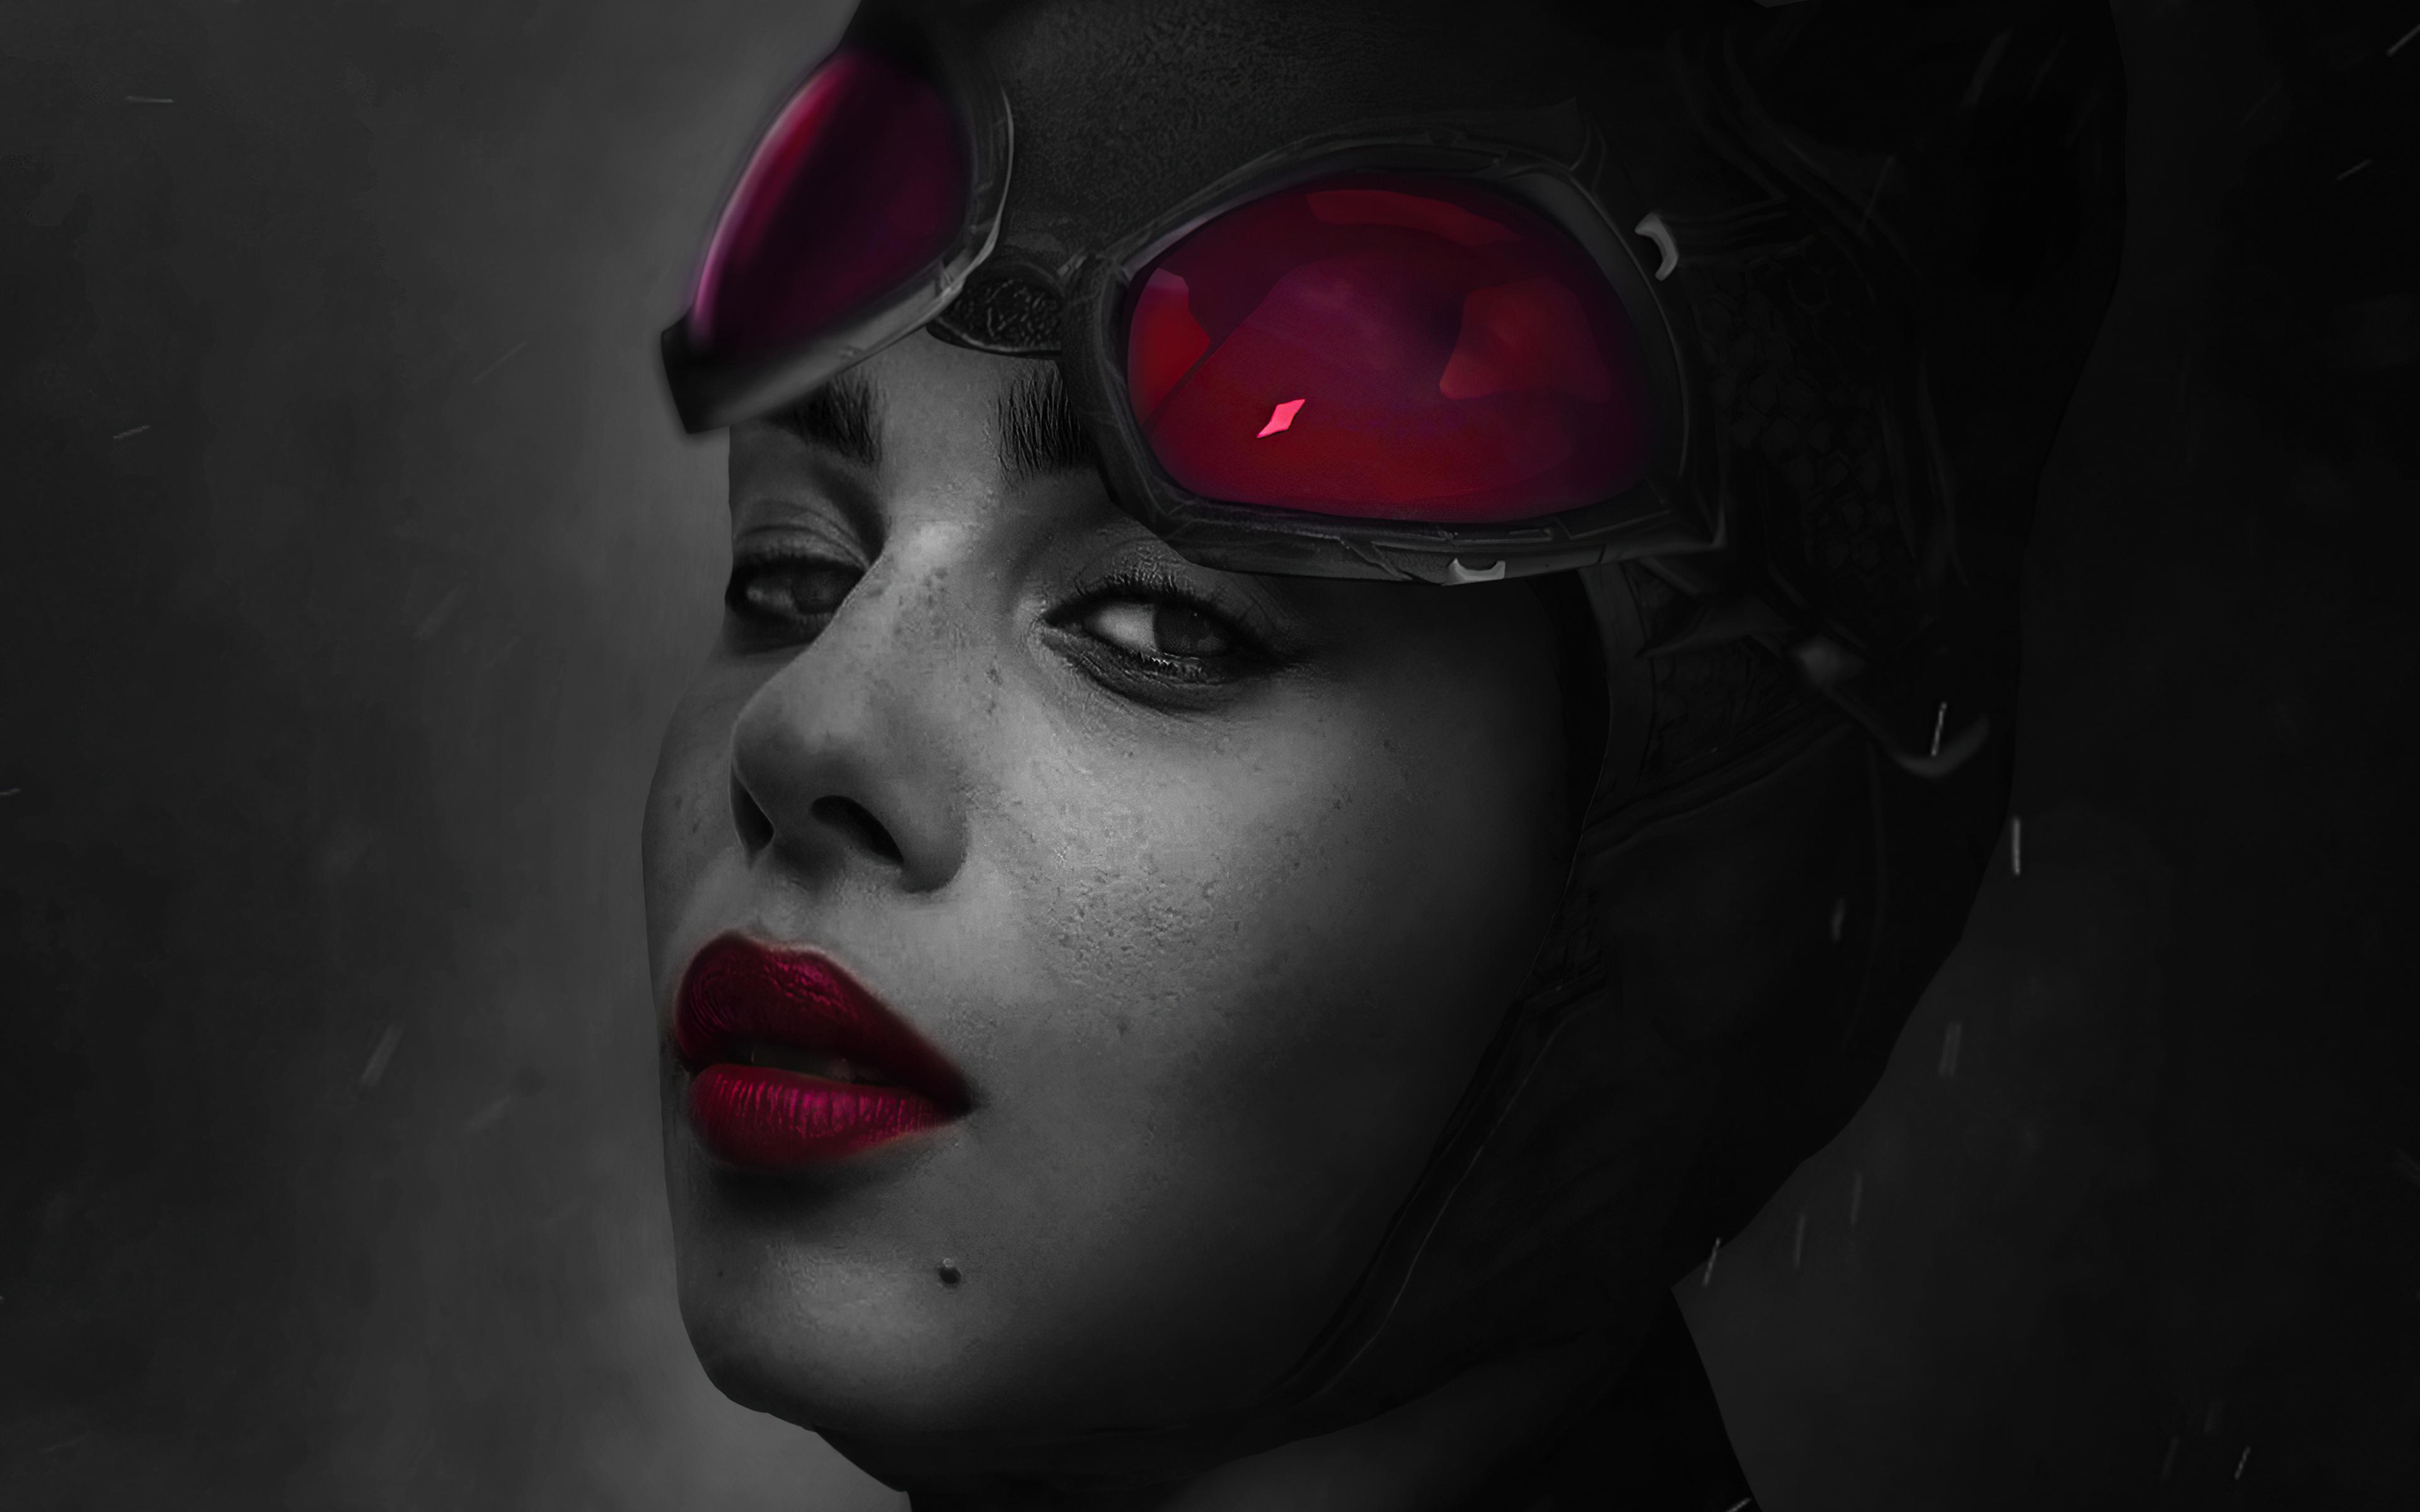 catwoman-the-batman-movie-4k-ka.jpg